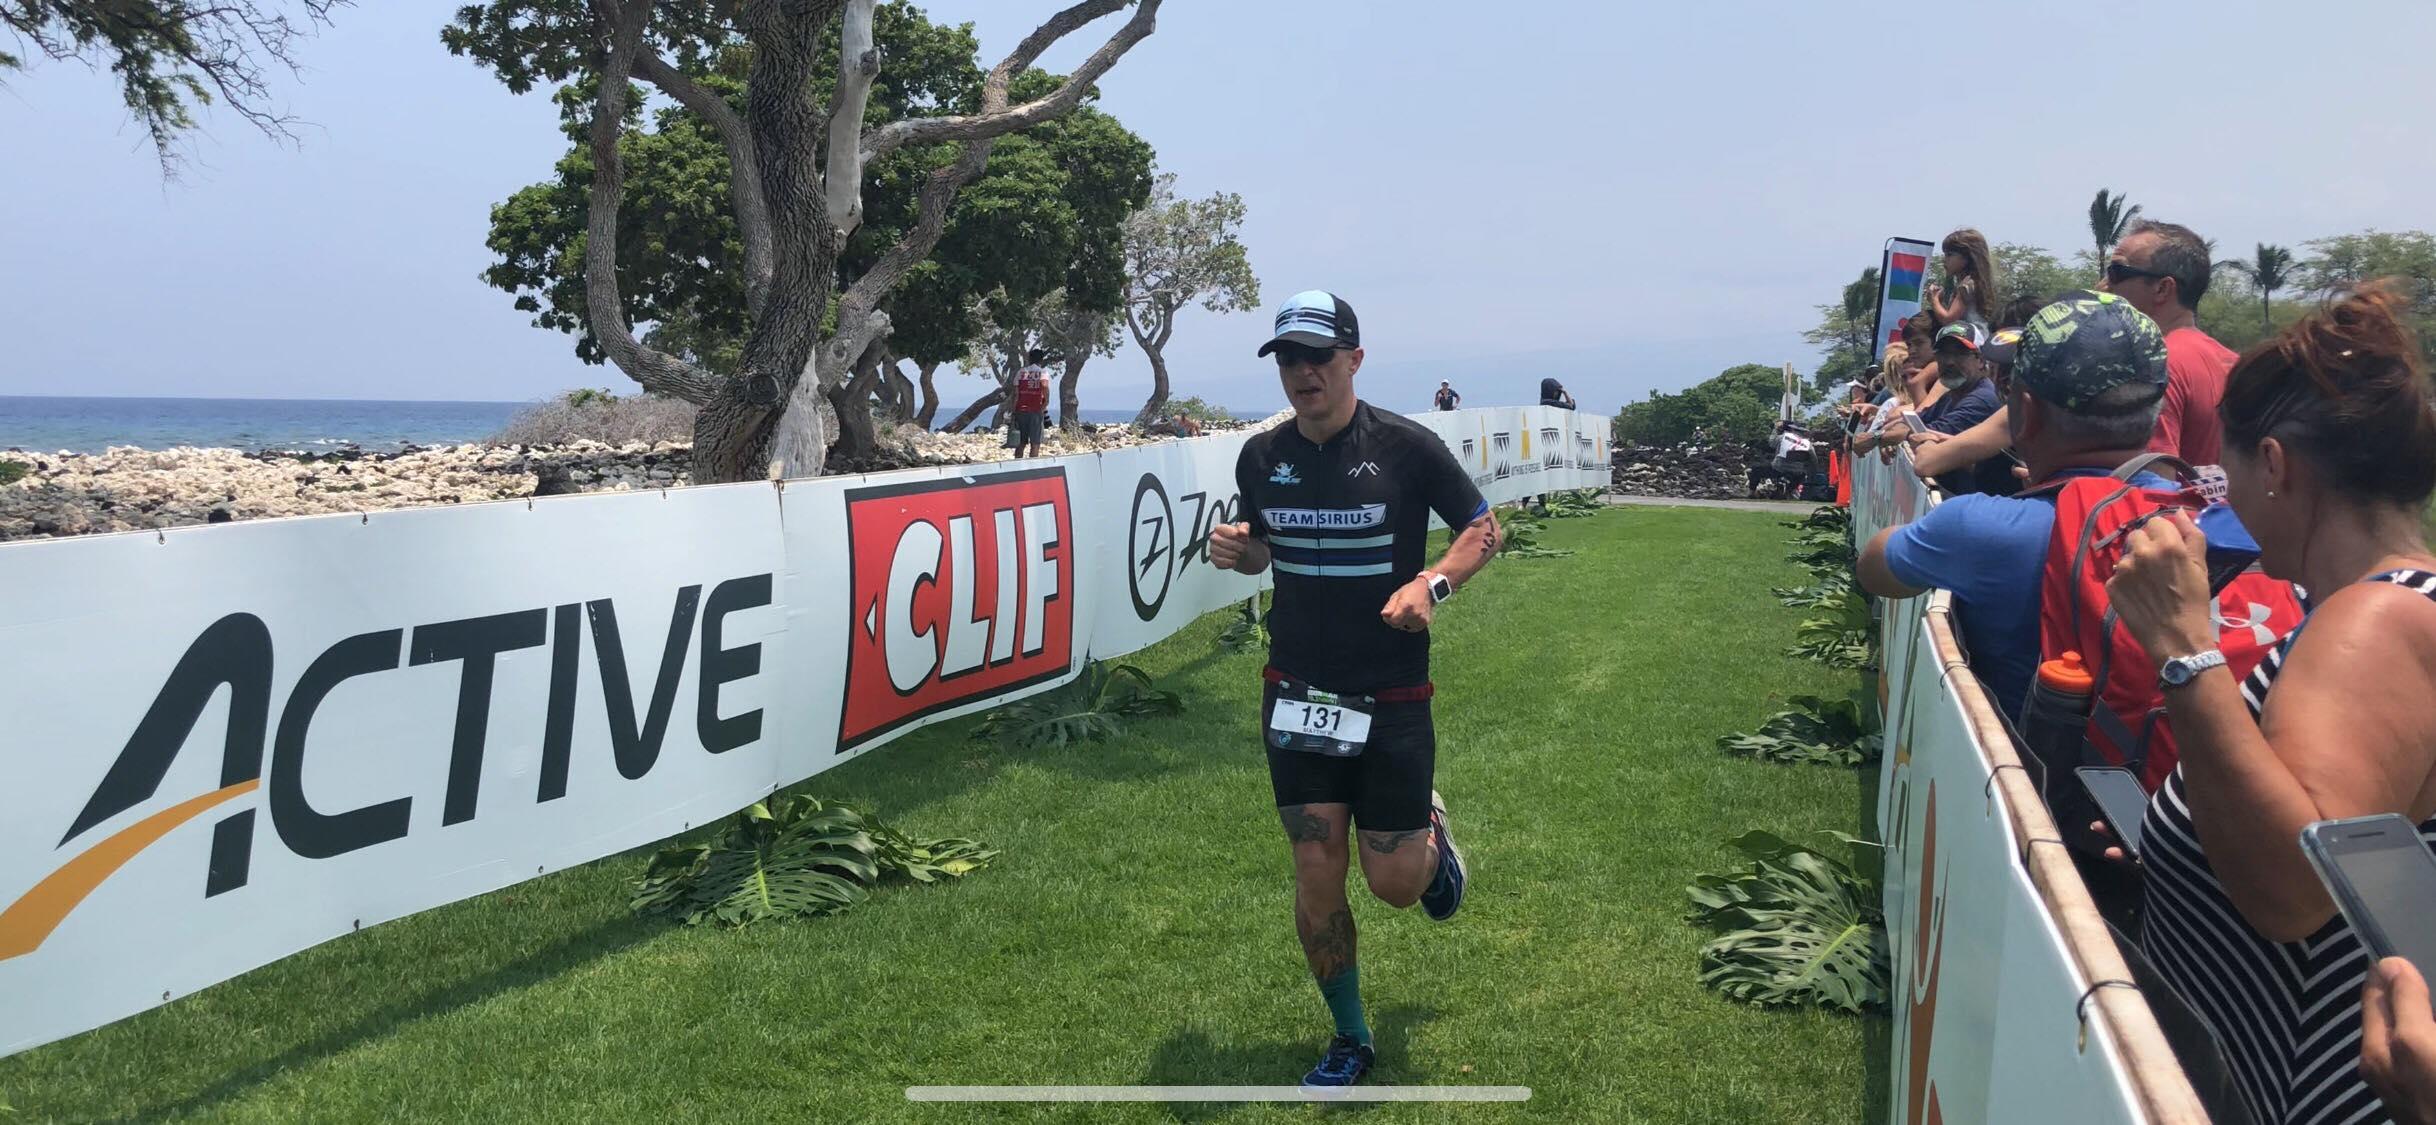 Coach_Terry_Wilson_Matt_Vella_Ironman_Hawaii_70.3_Finish_Chute.jpg